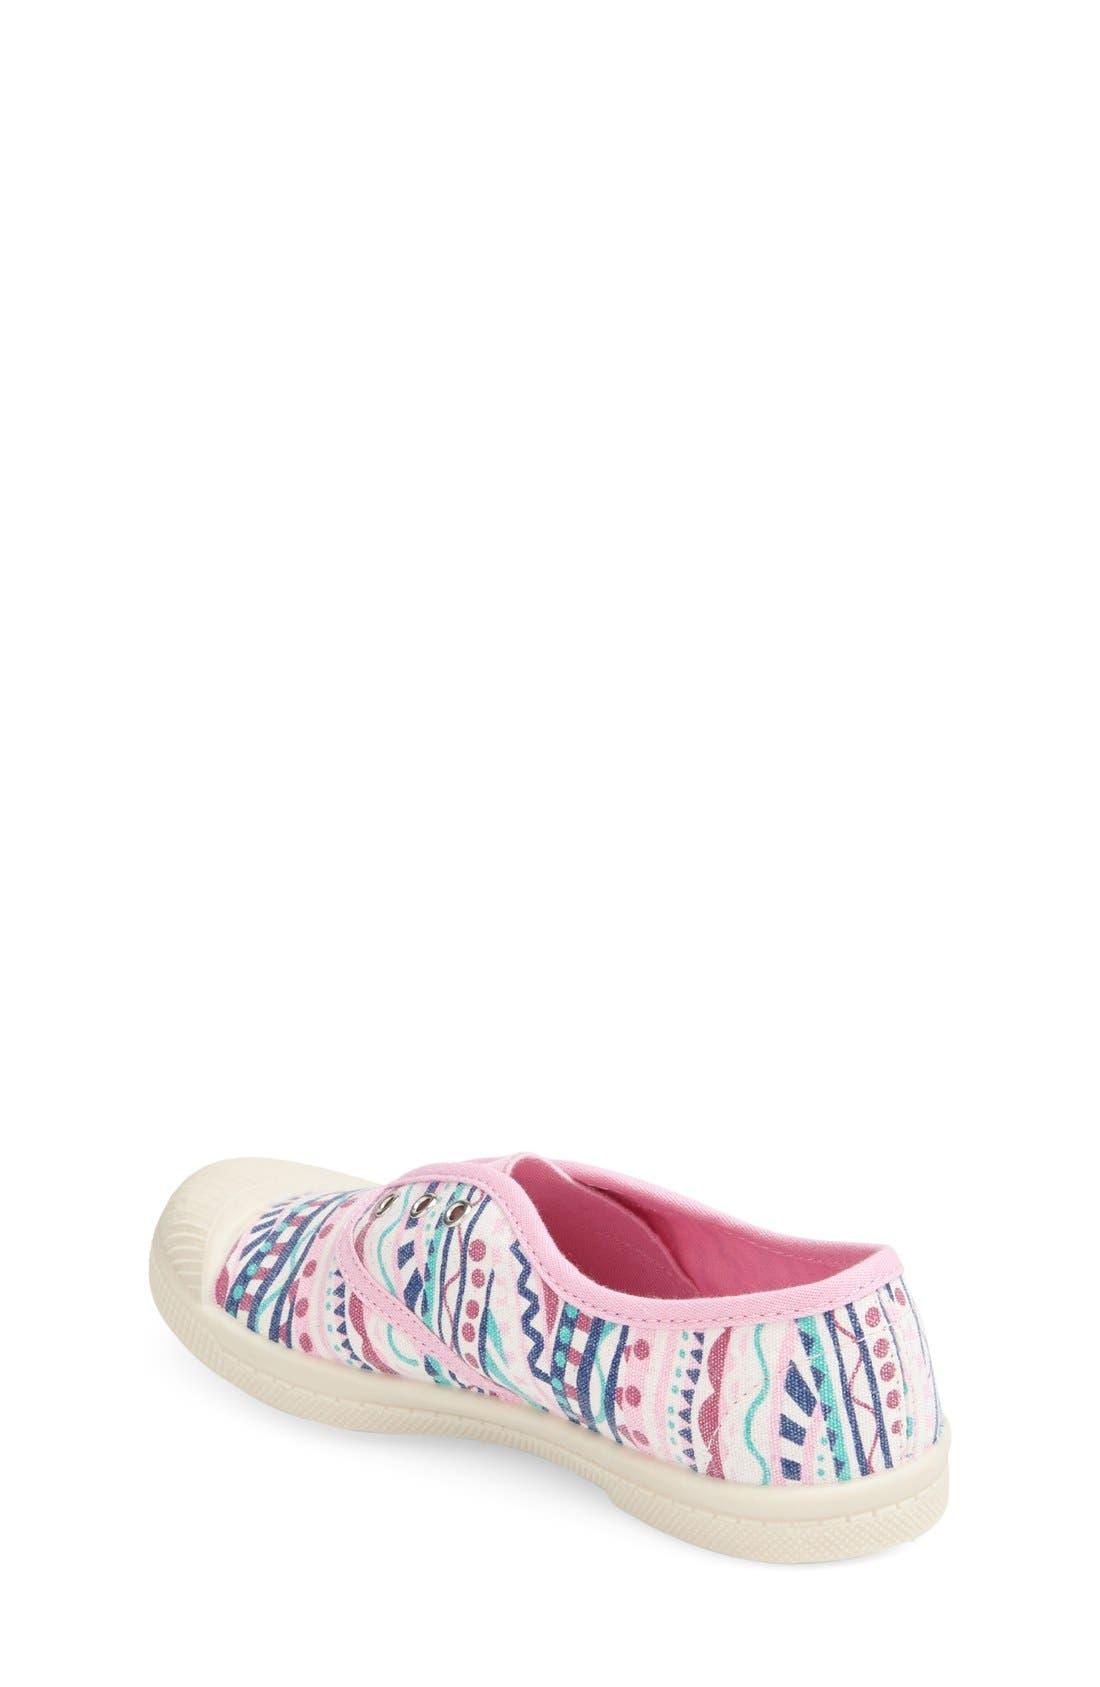 Alternate Image 2  - Tucker + Tate 'Marin' Canvas Slip-On Sneaker (Toddler, Little Kid & Big Kid)